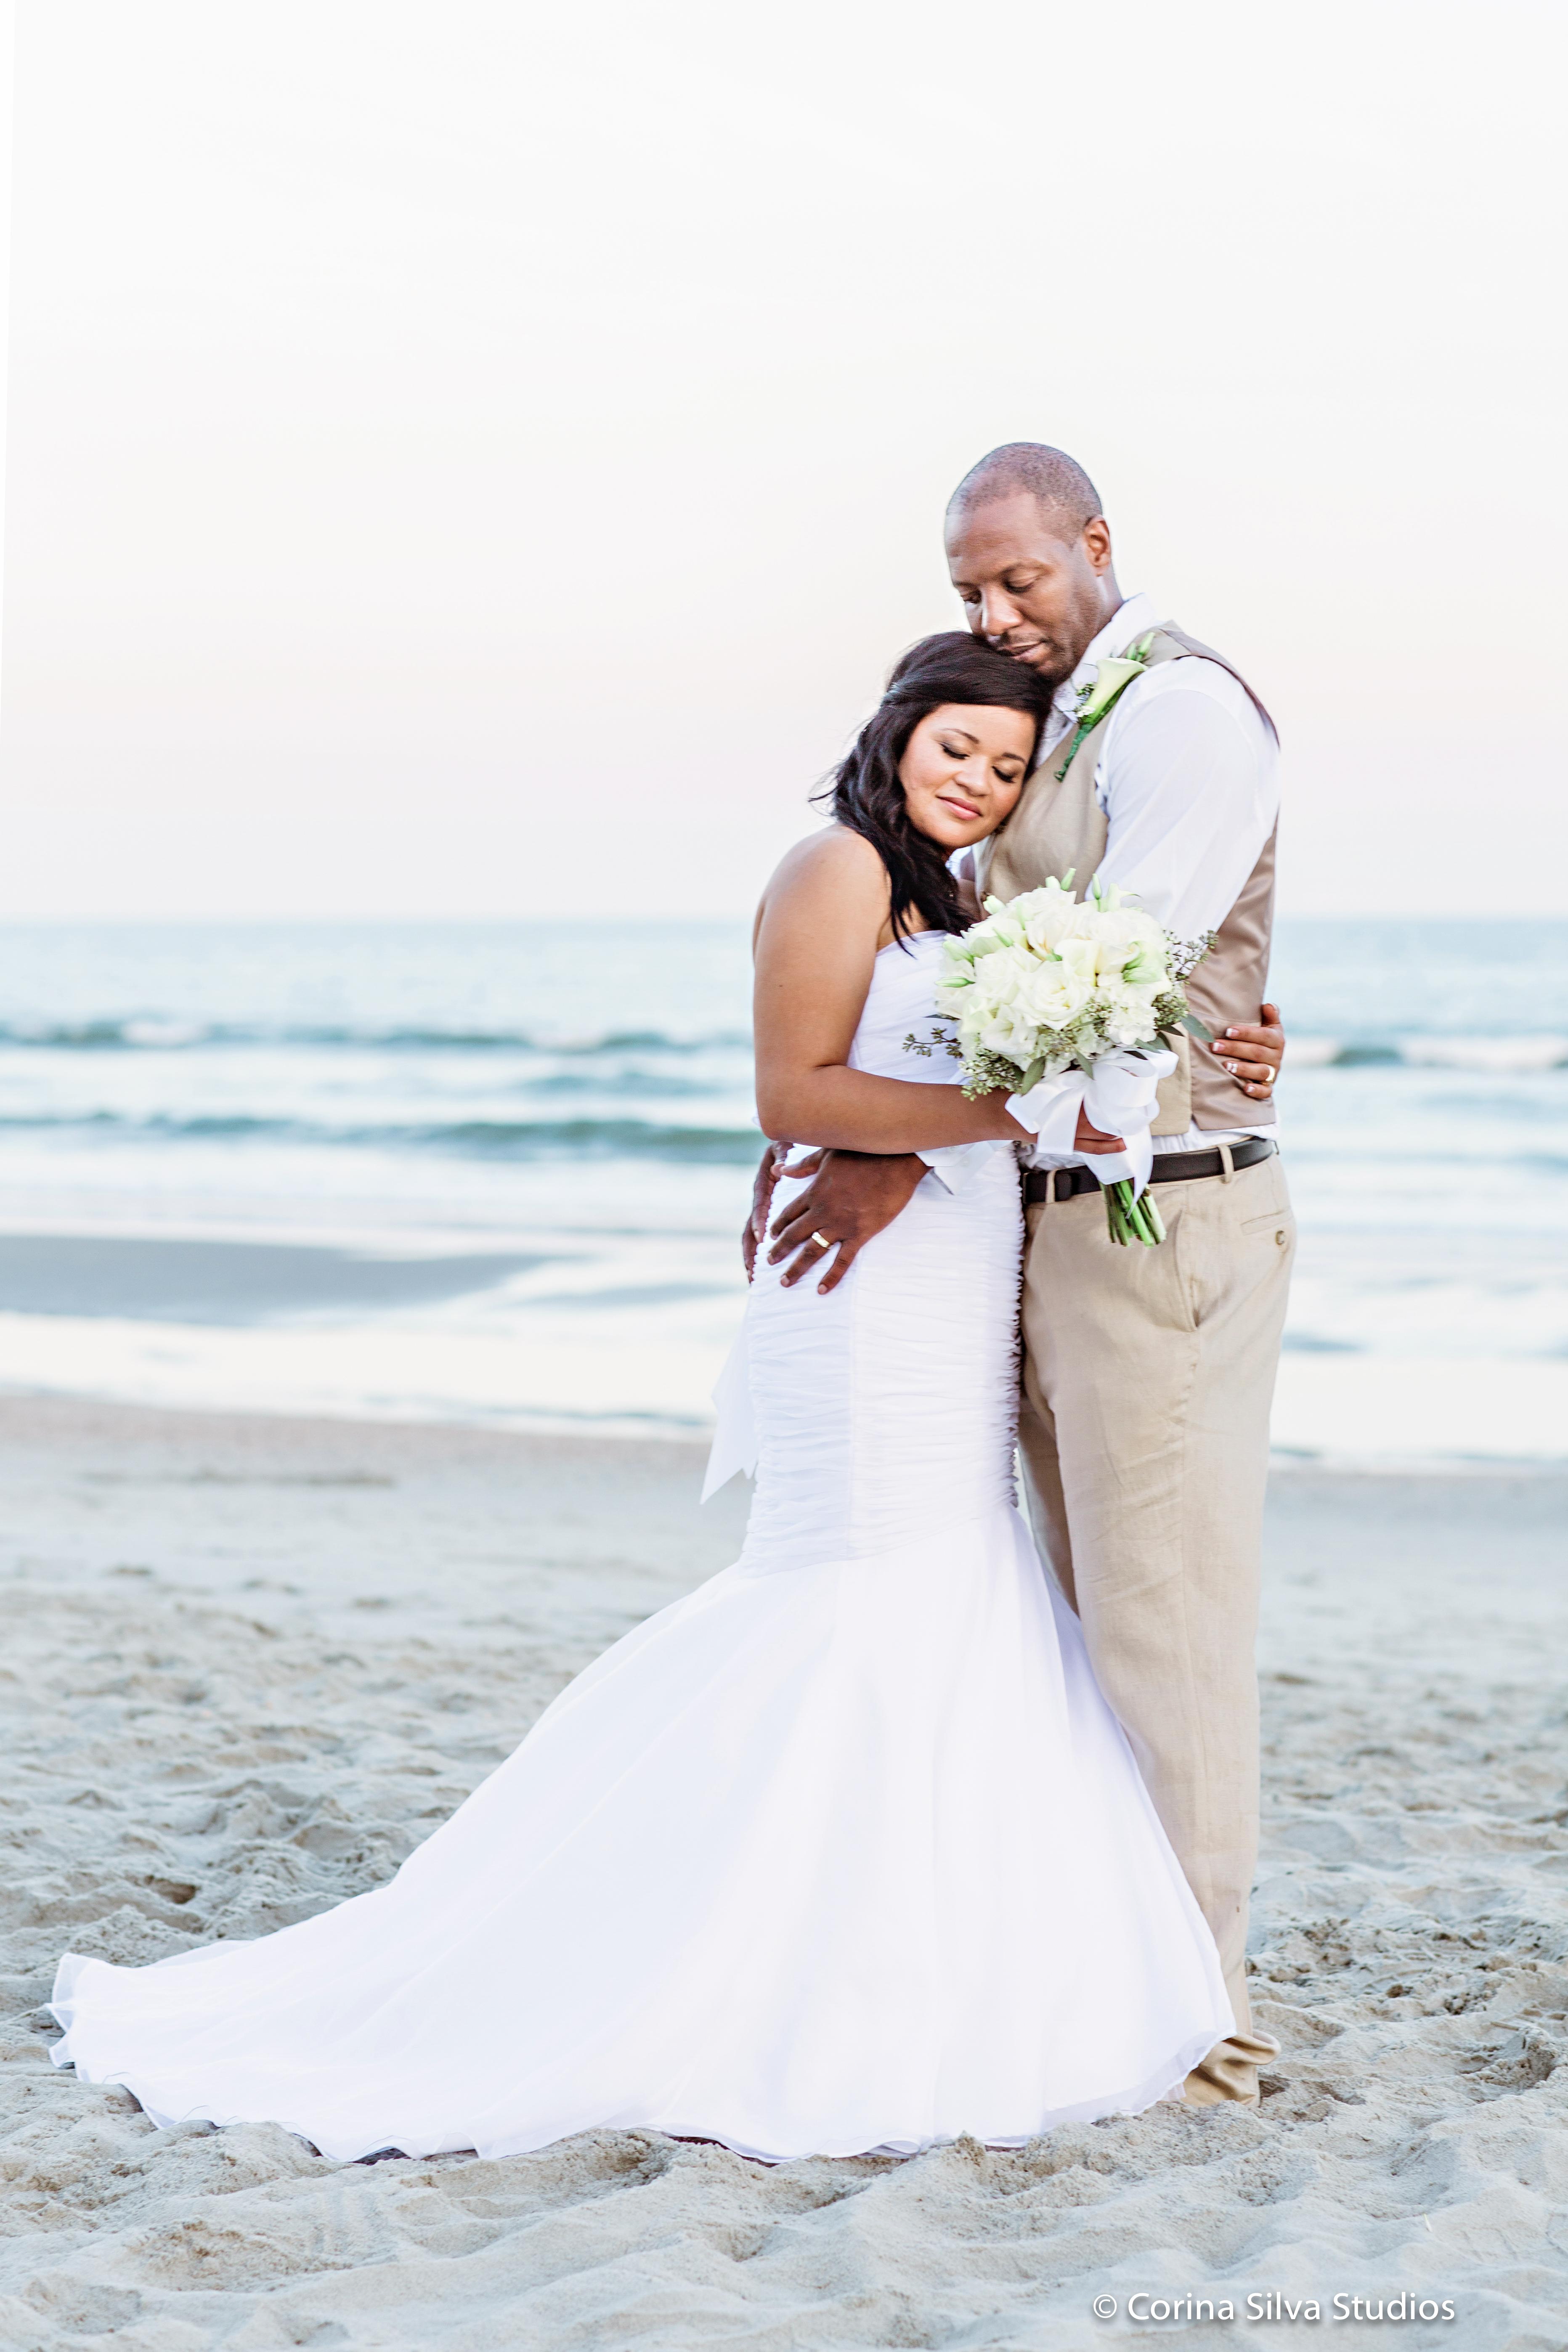 TiaTomas Wedding DayCorina Silva StudiosGigi Noelle EventsDestination Weddings Myrtle Beach 29